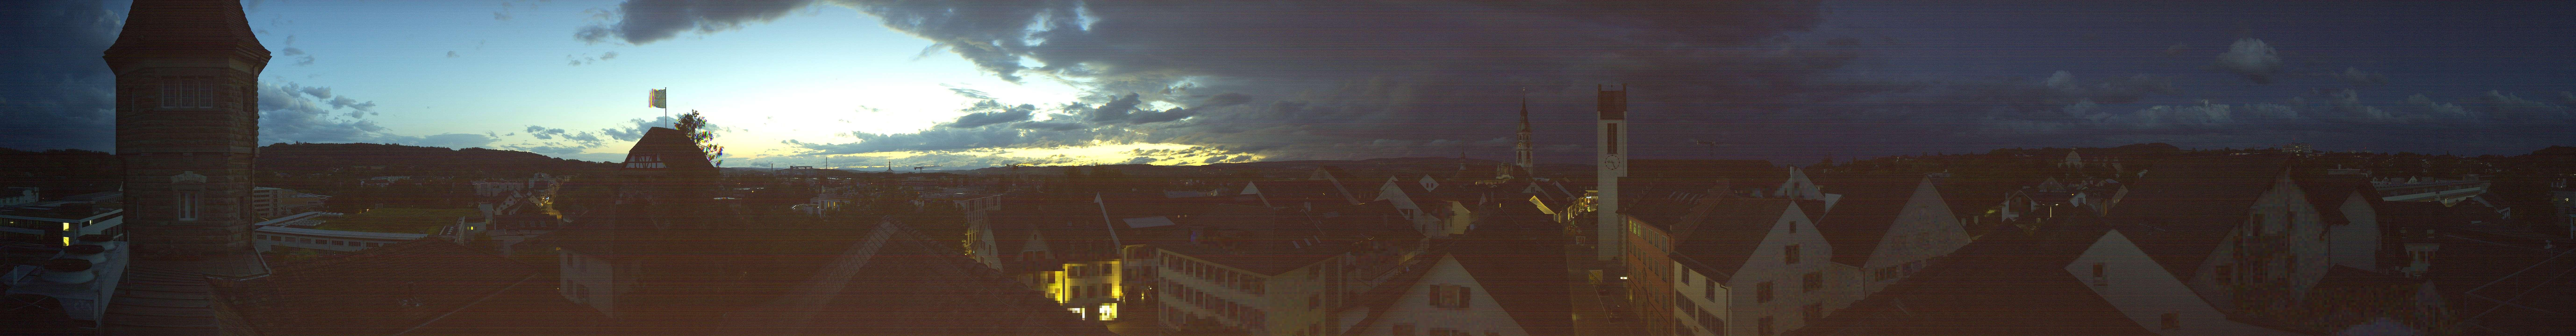 Webcam Frauenfeld